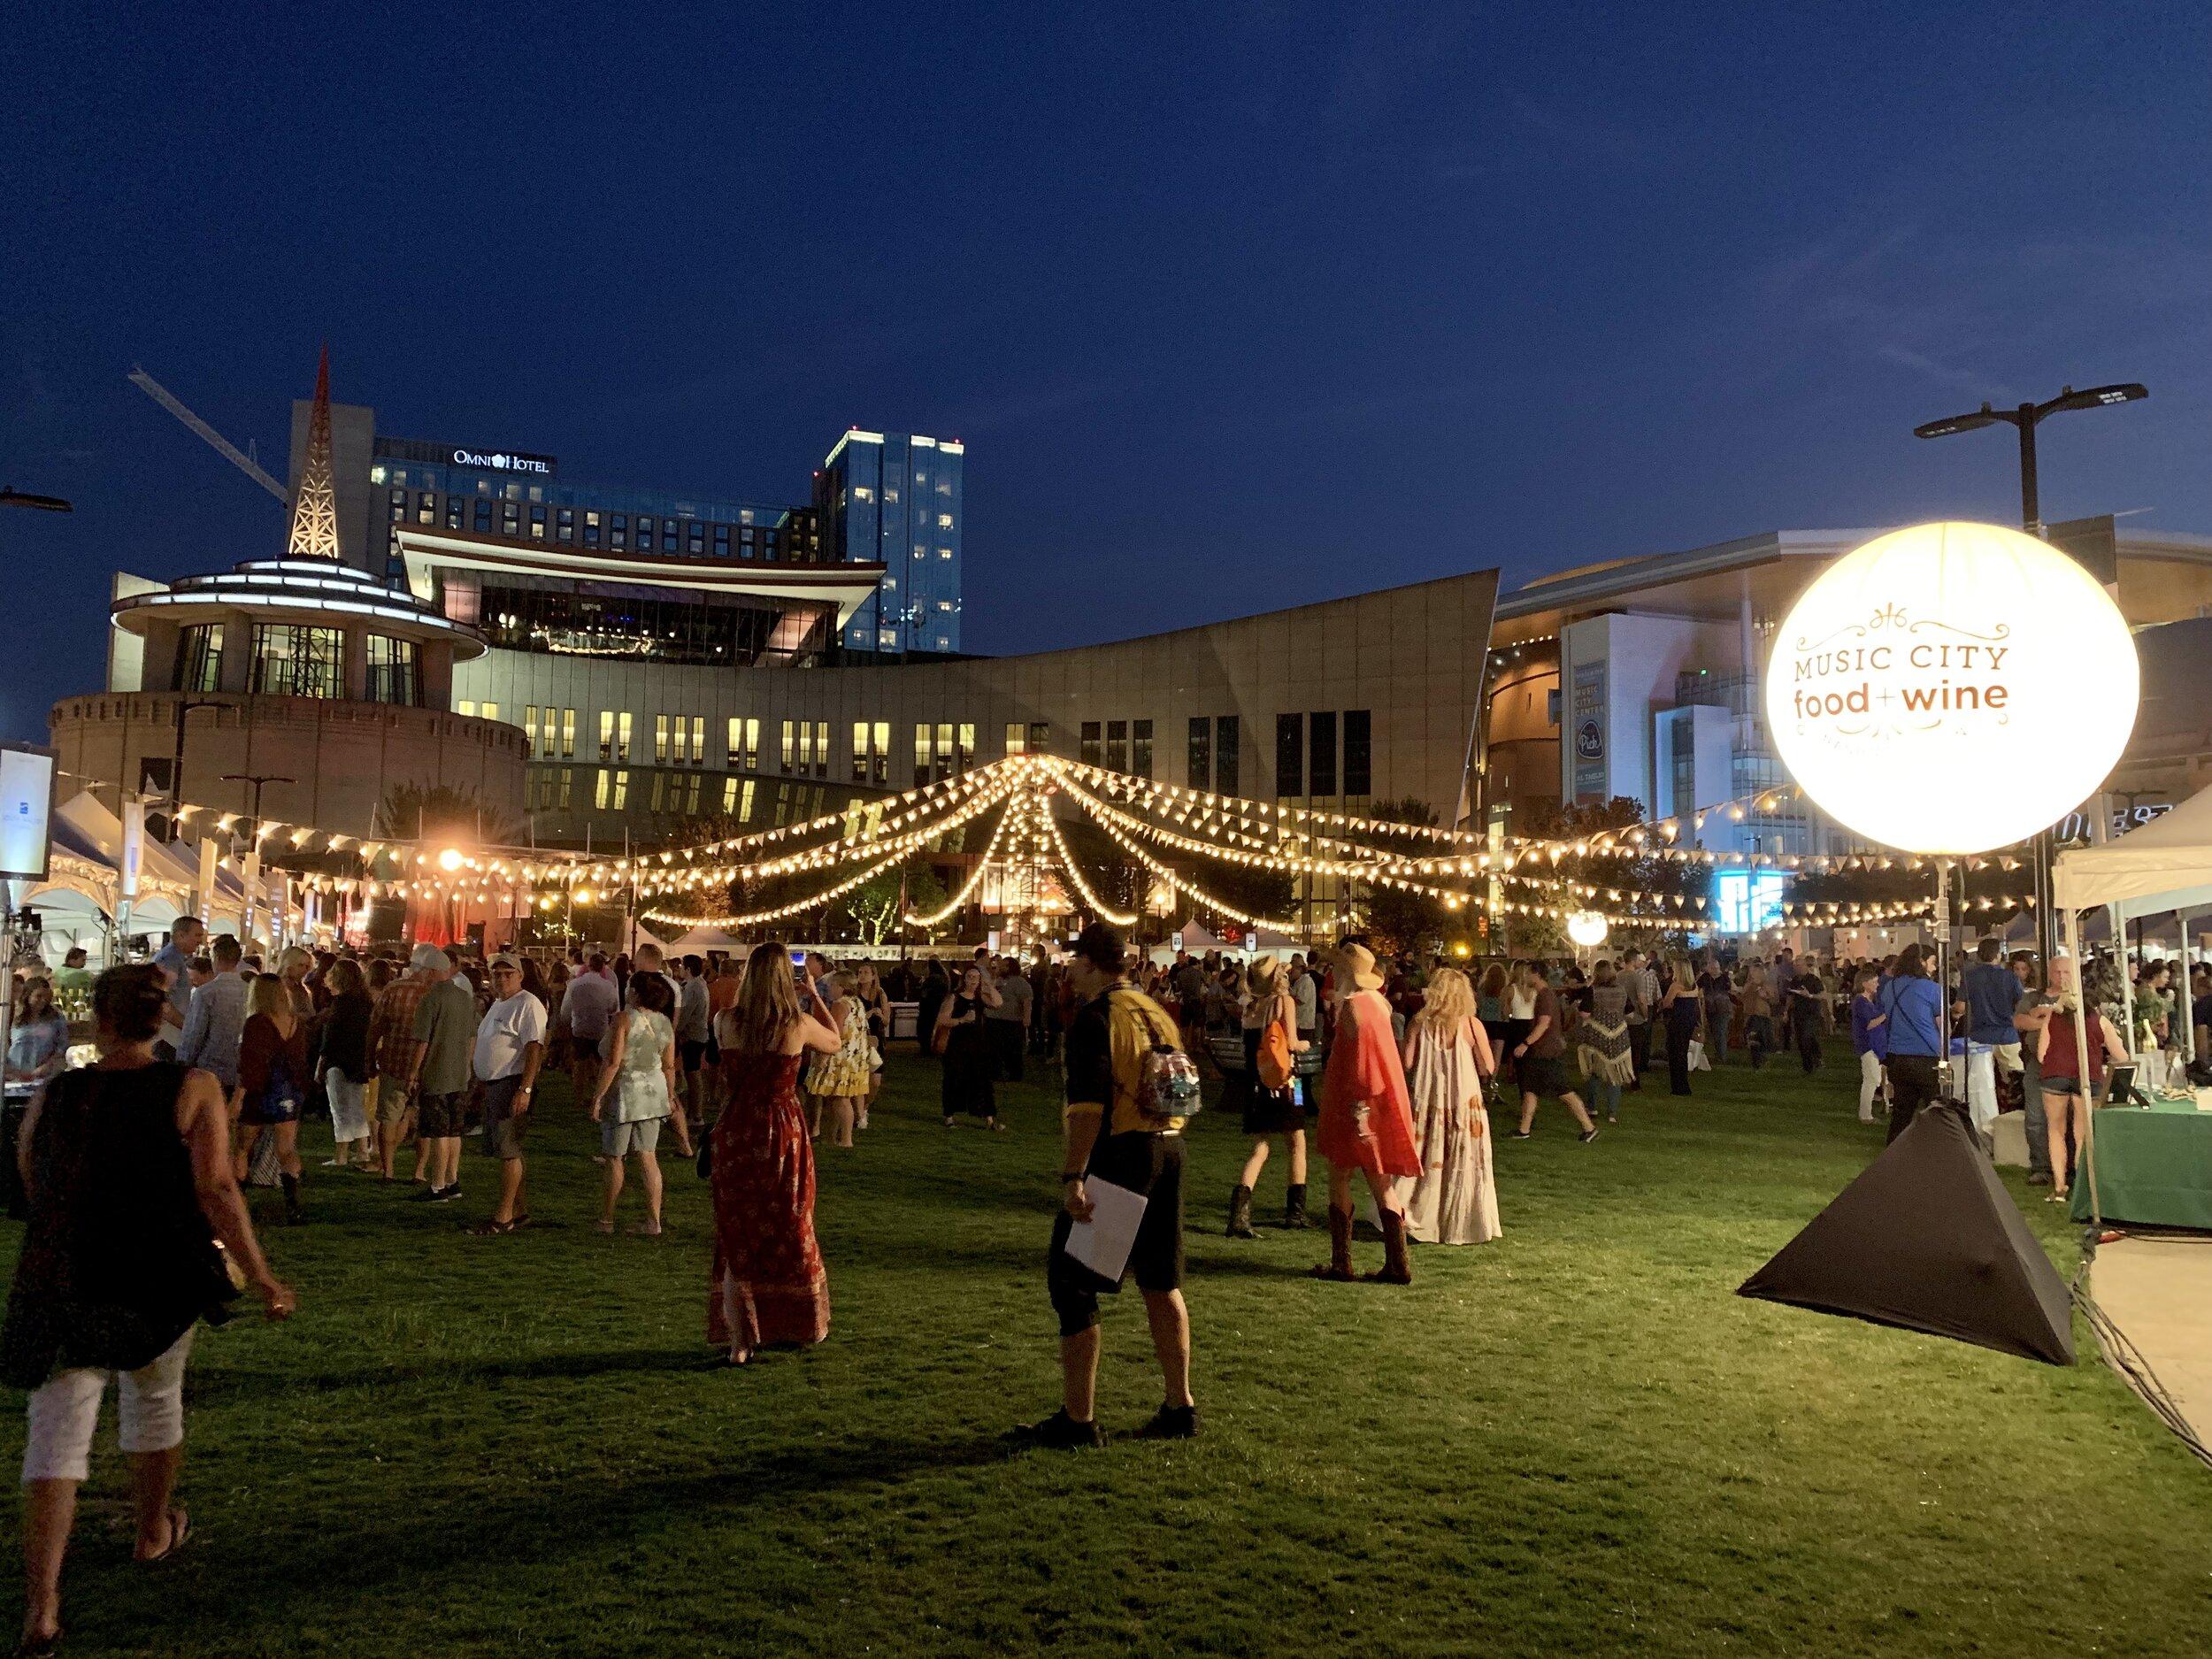 Music City Food And Wine | Harvest Night